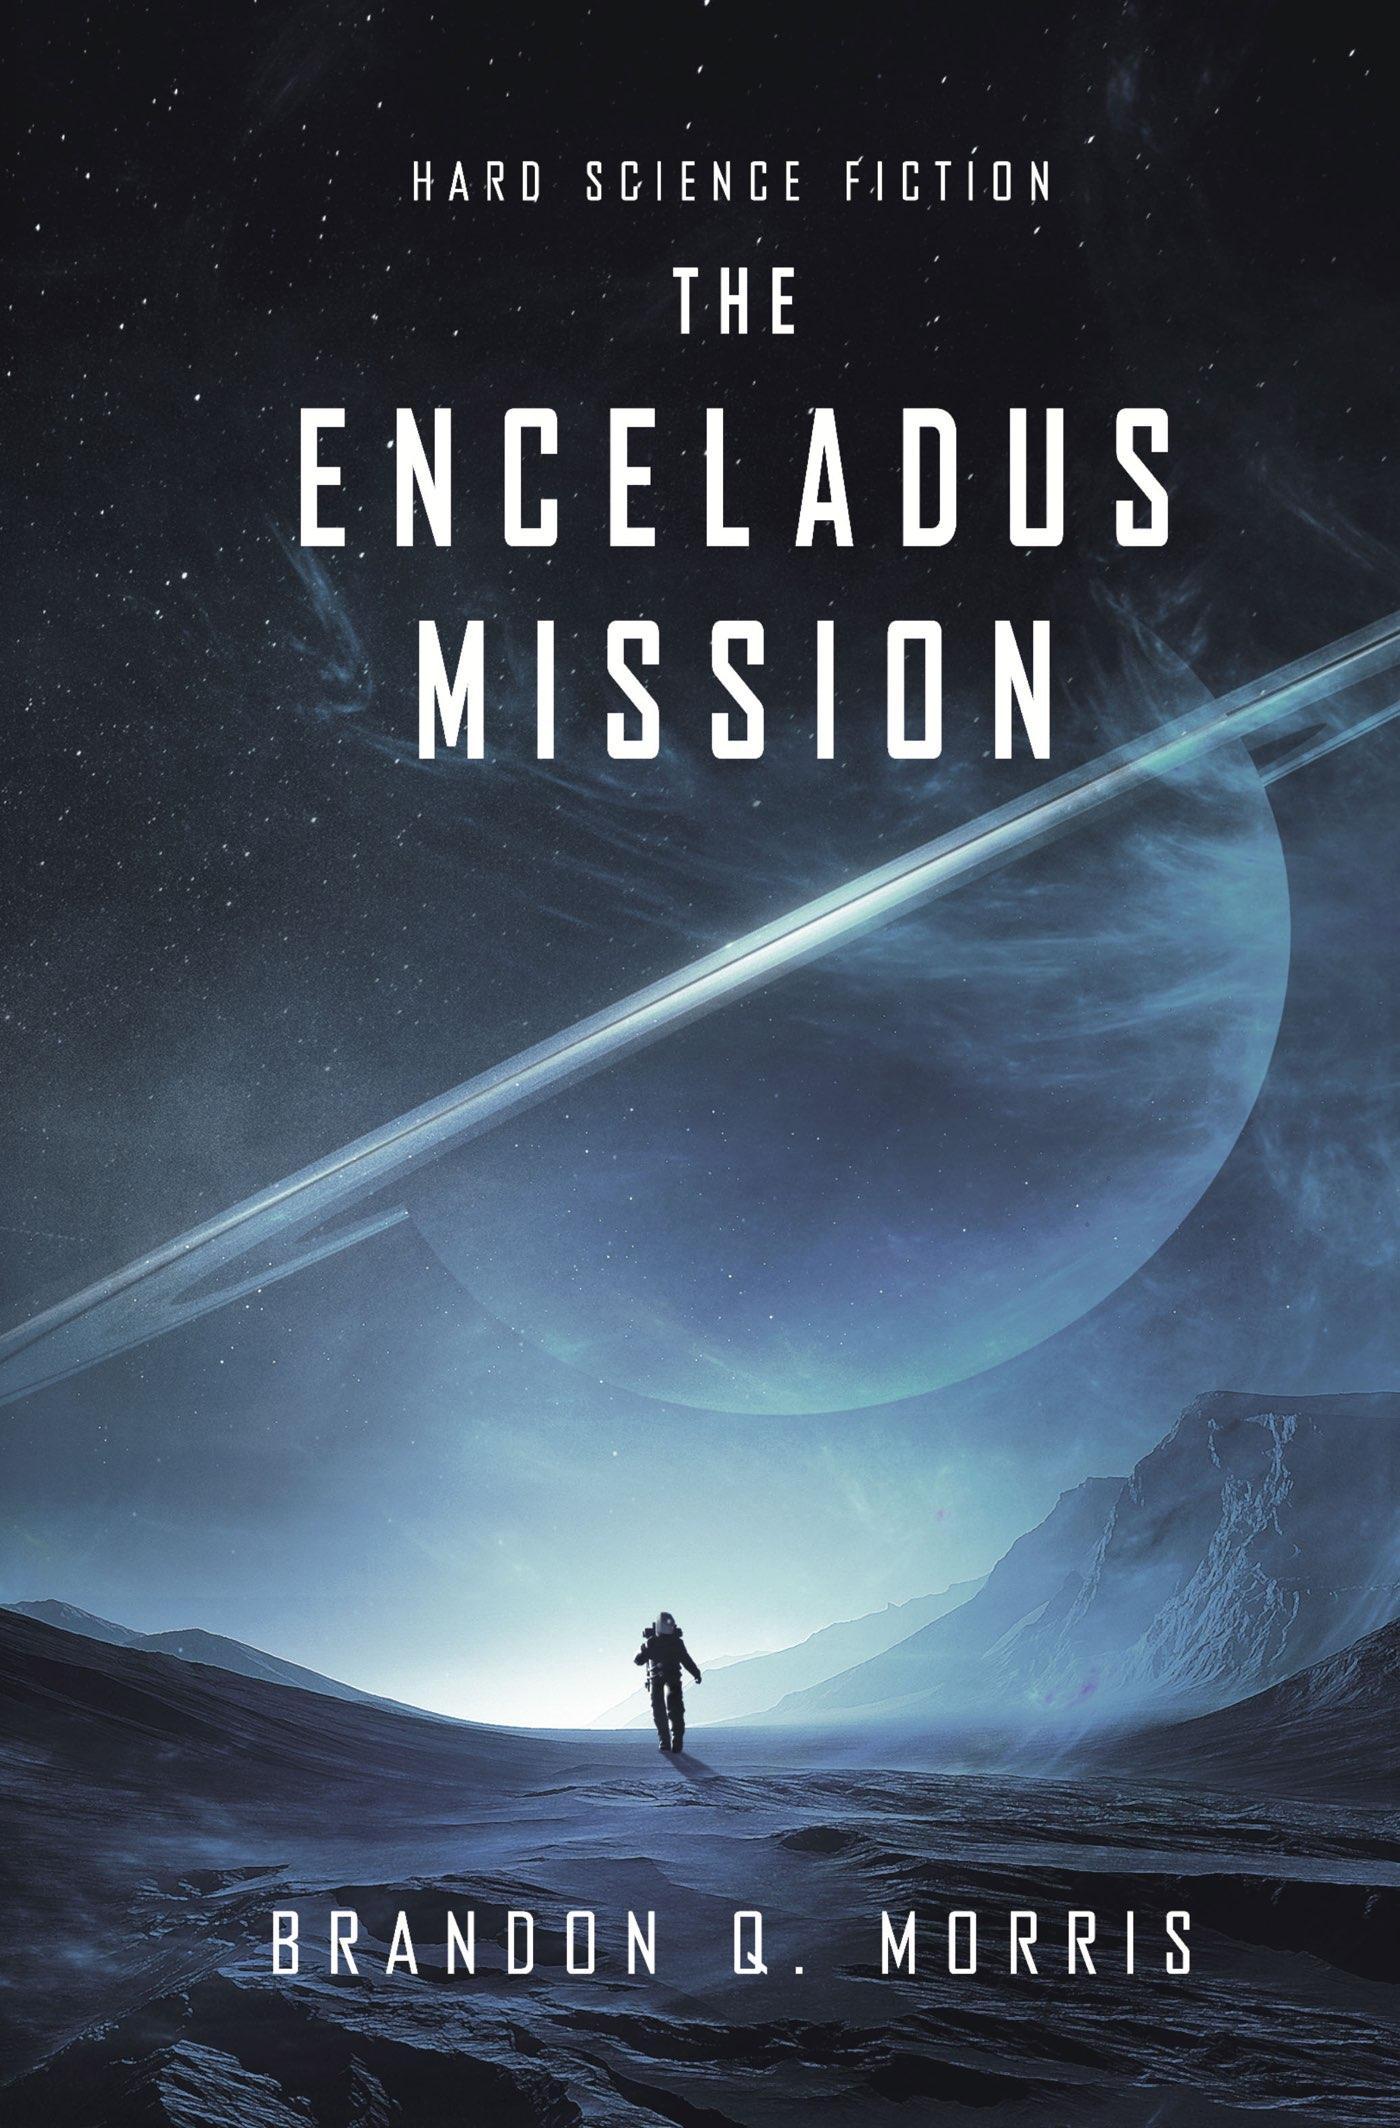 Books by Brandon Q. Morris | Hard Science Fiction